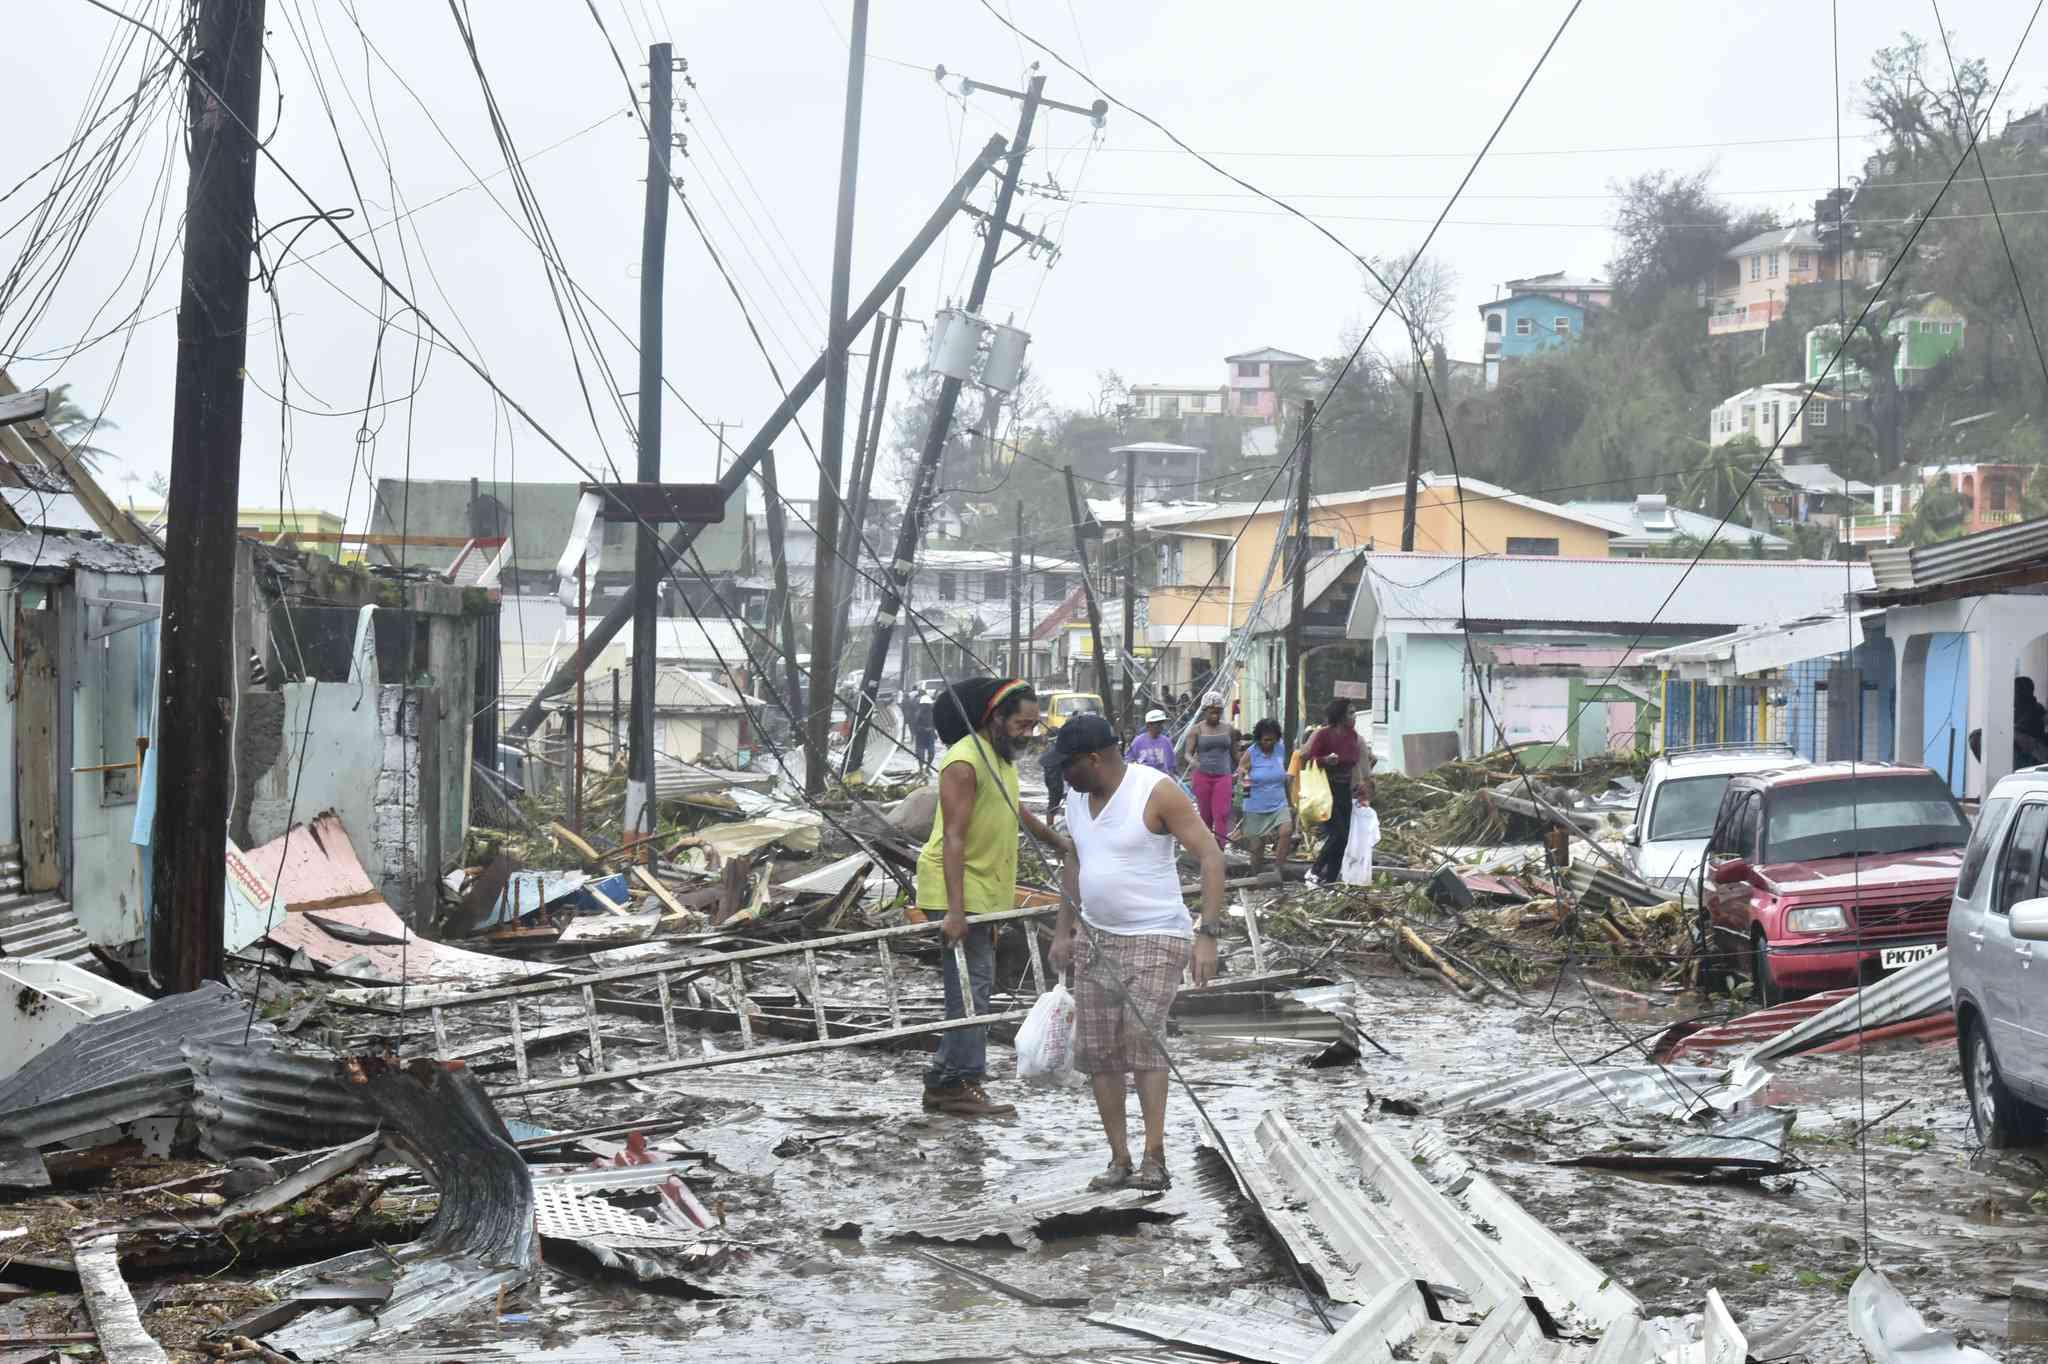 Hurricane Maria 2017 damage in Dominica